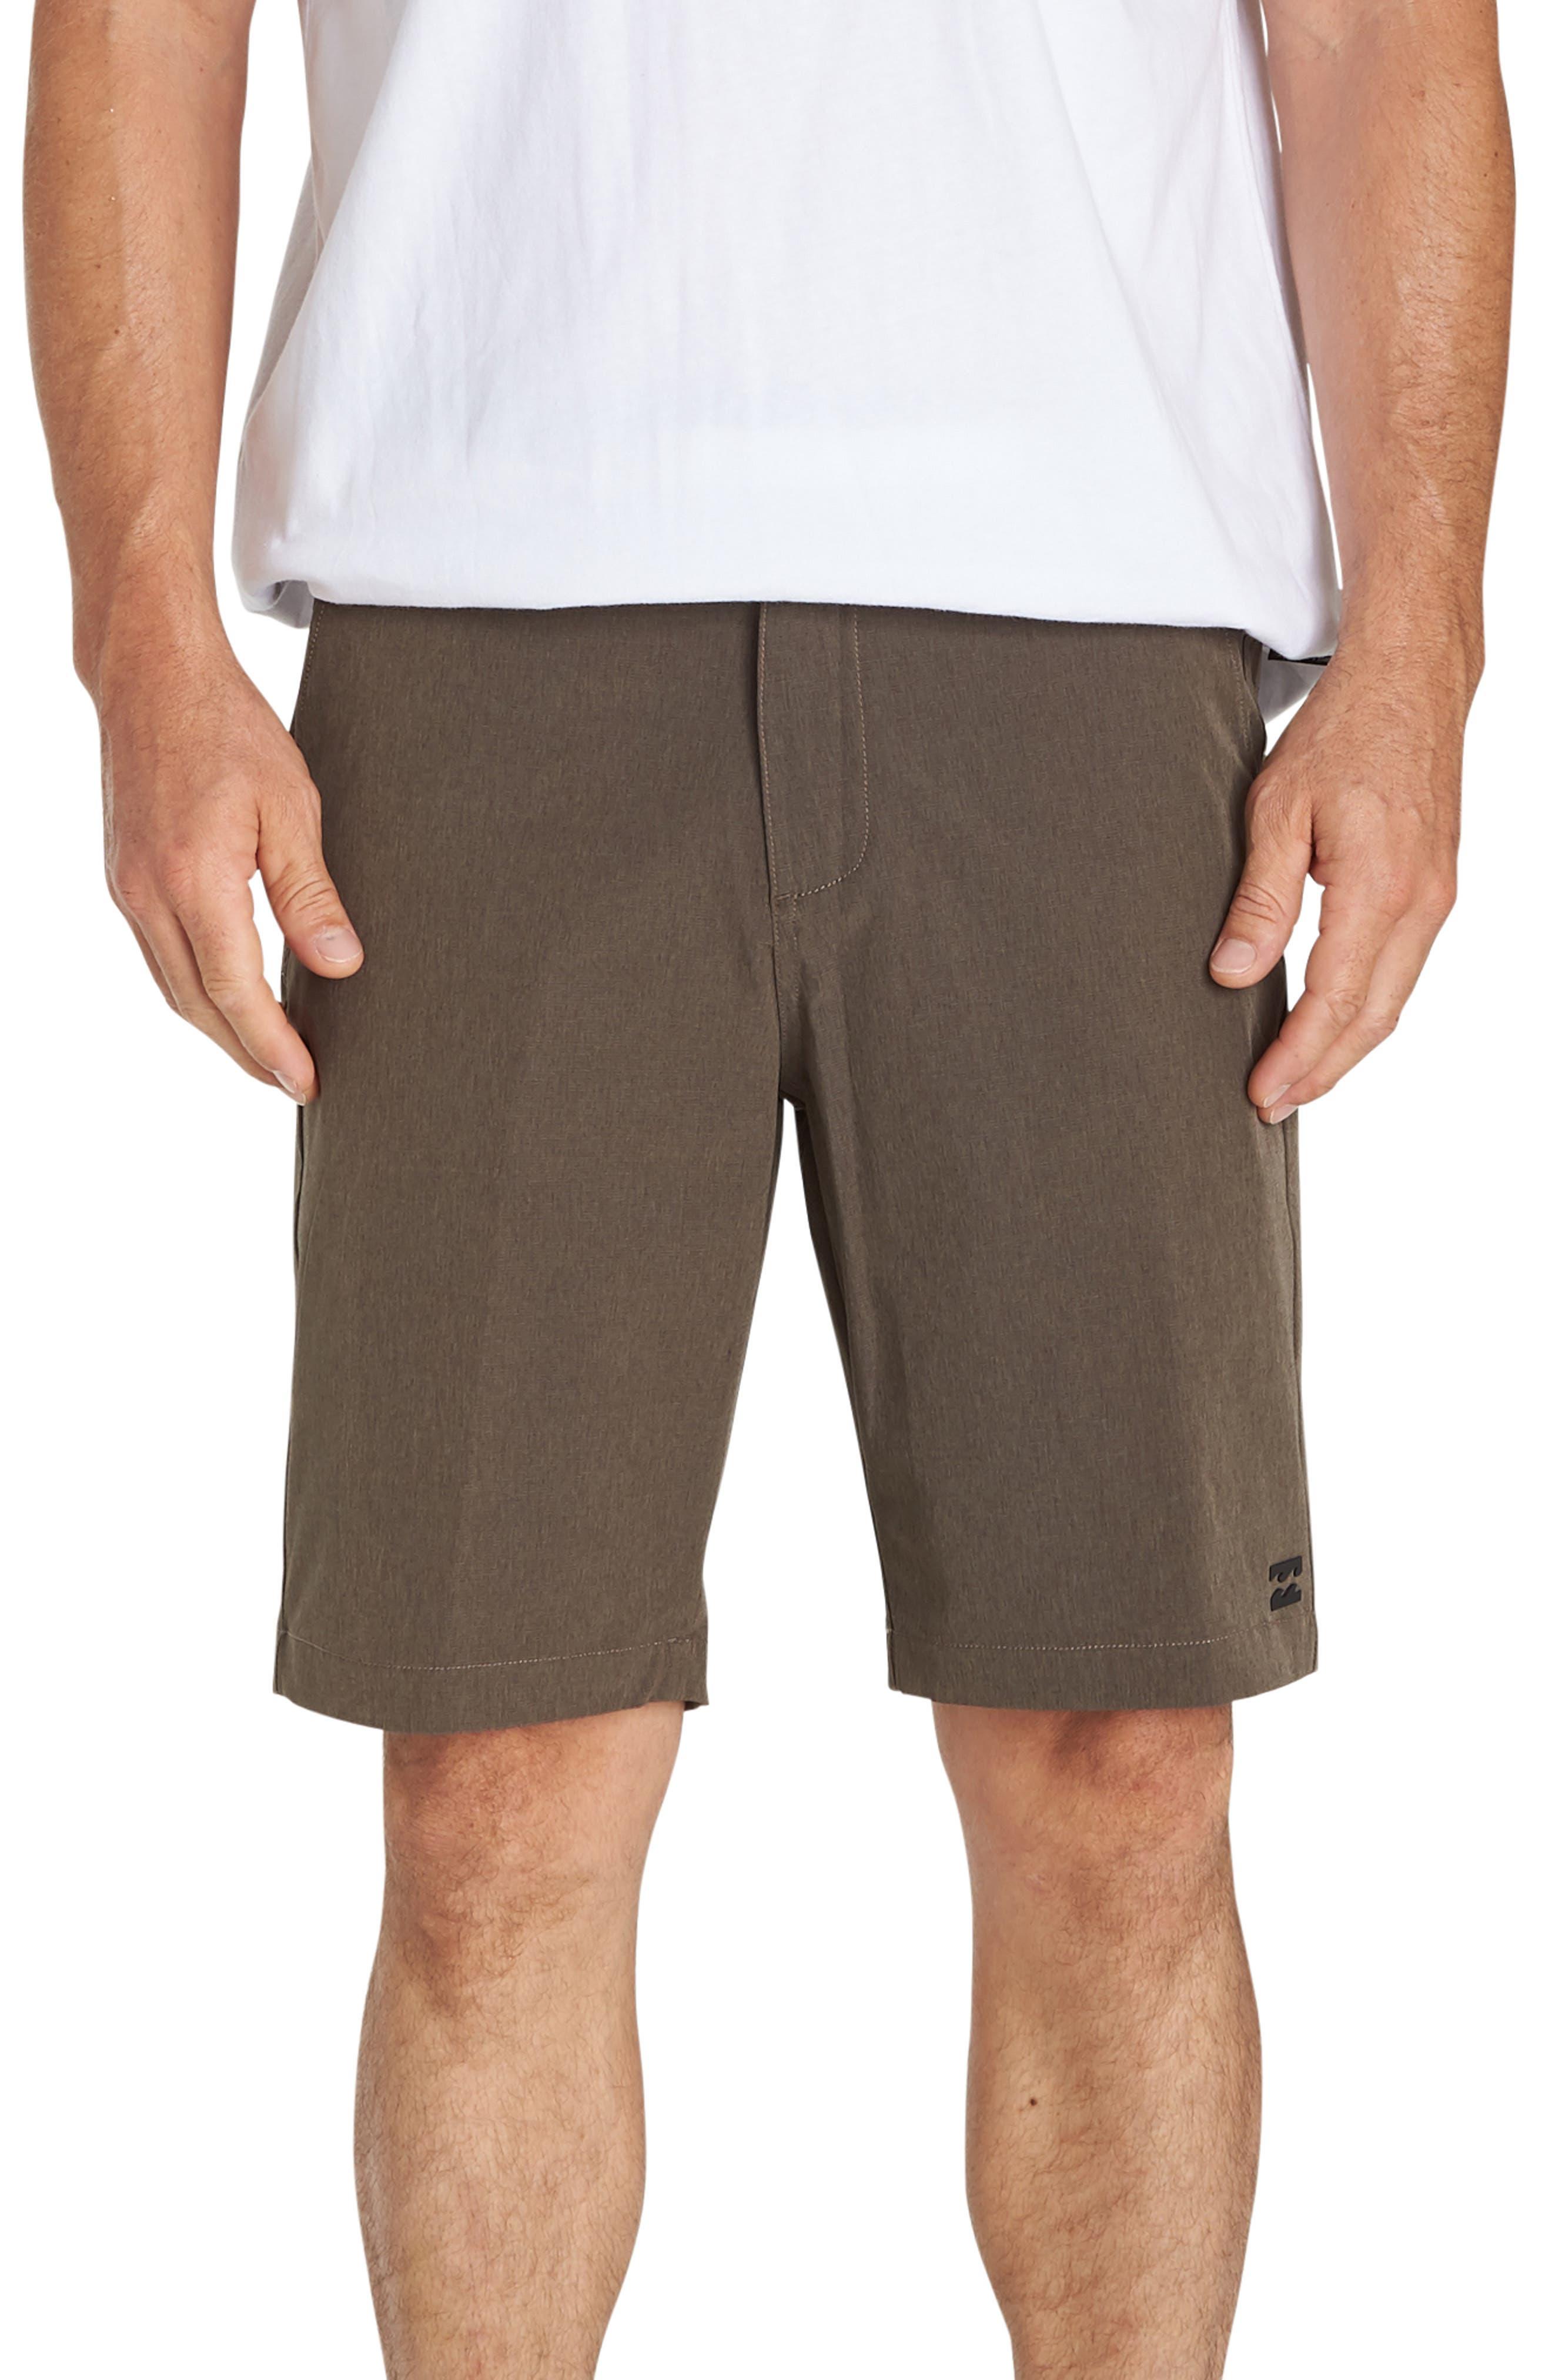 Billabong Crossfire X Mid-Length Shorts, Brown